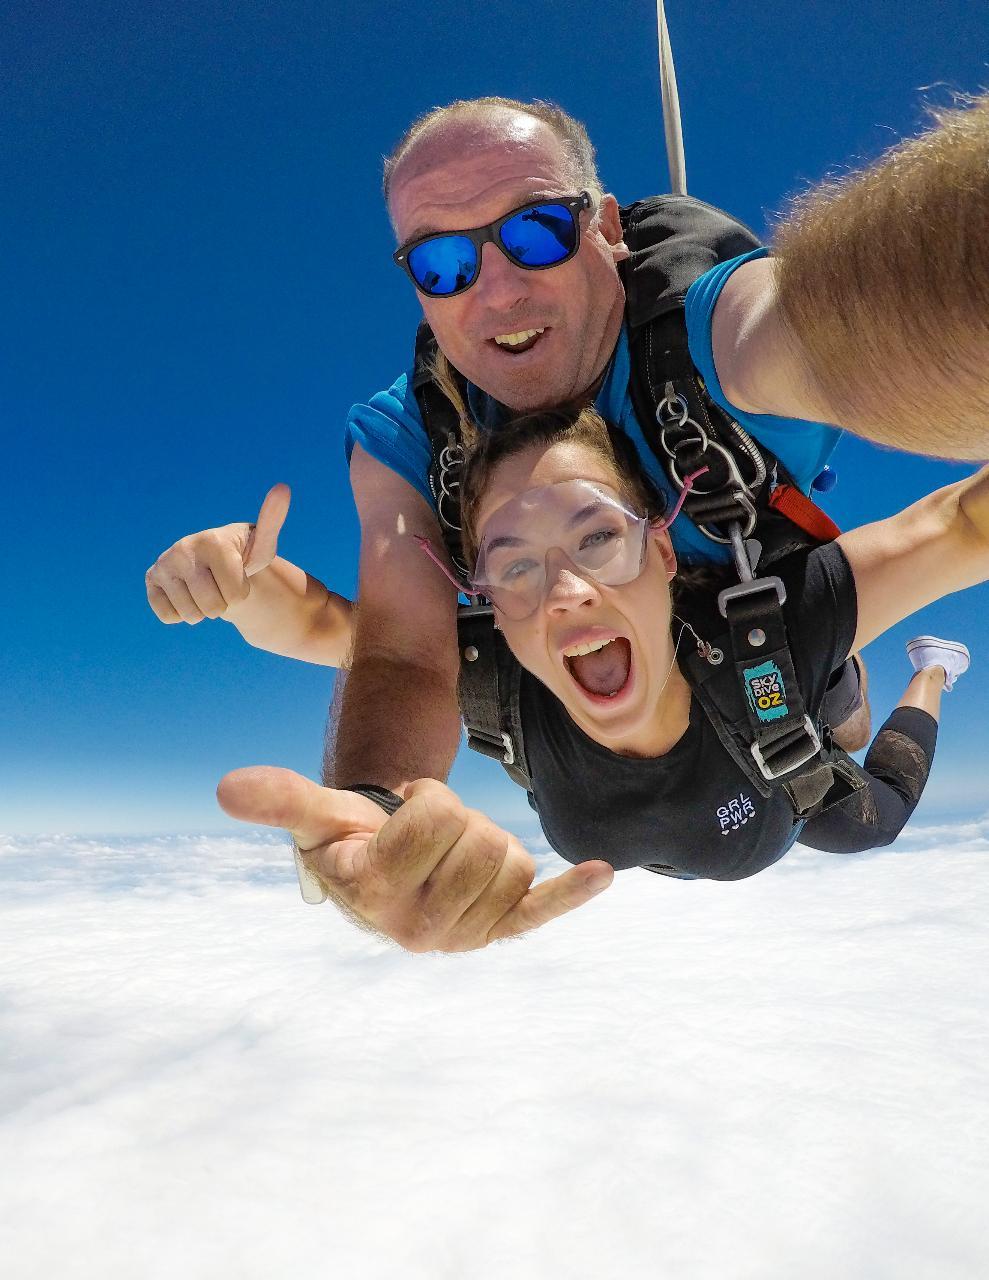 15,000ft Tandem Skydive - Wagga Wagga